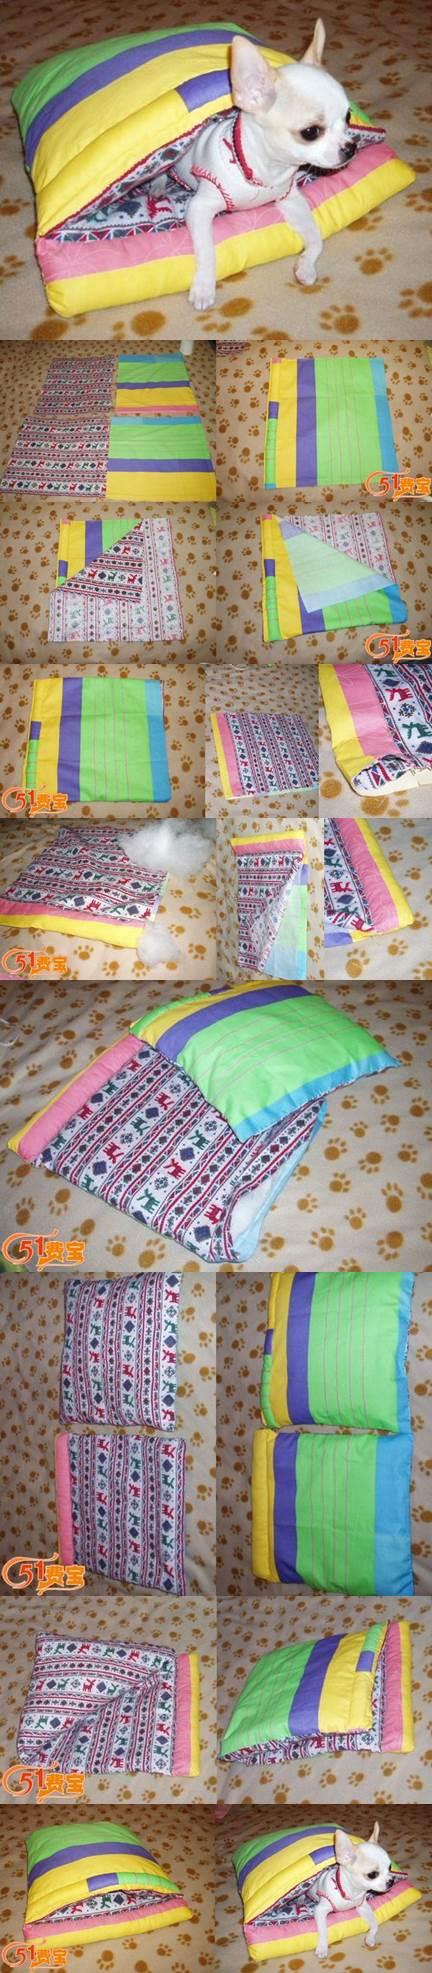 DIY Pet Sleeping Bag from Scraps 2